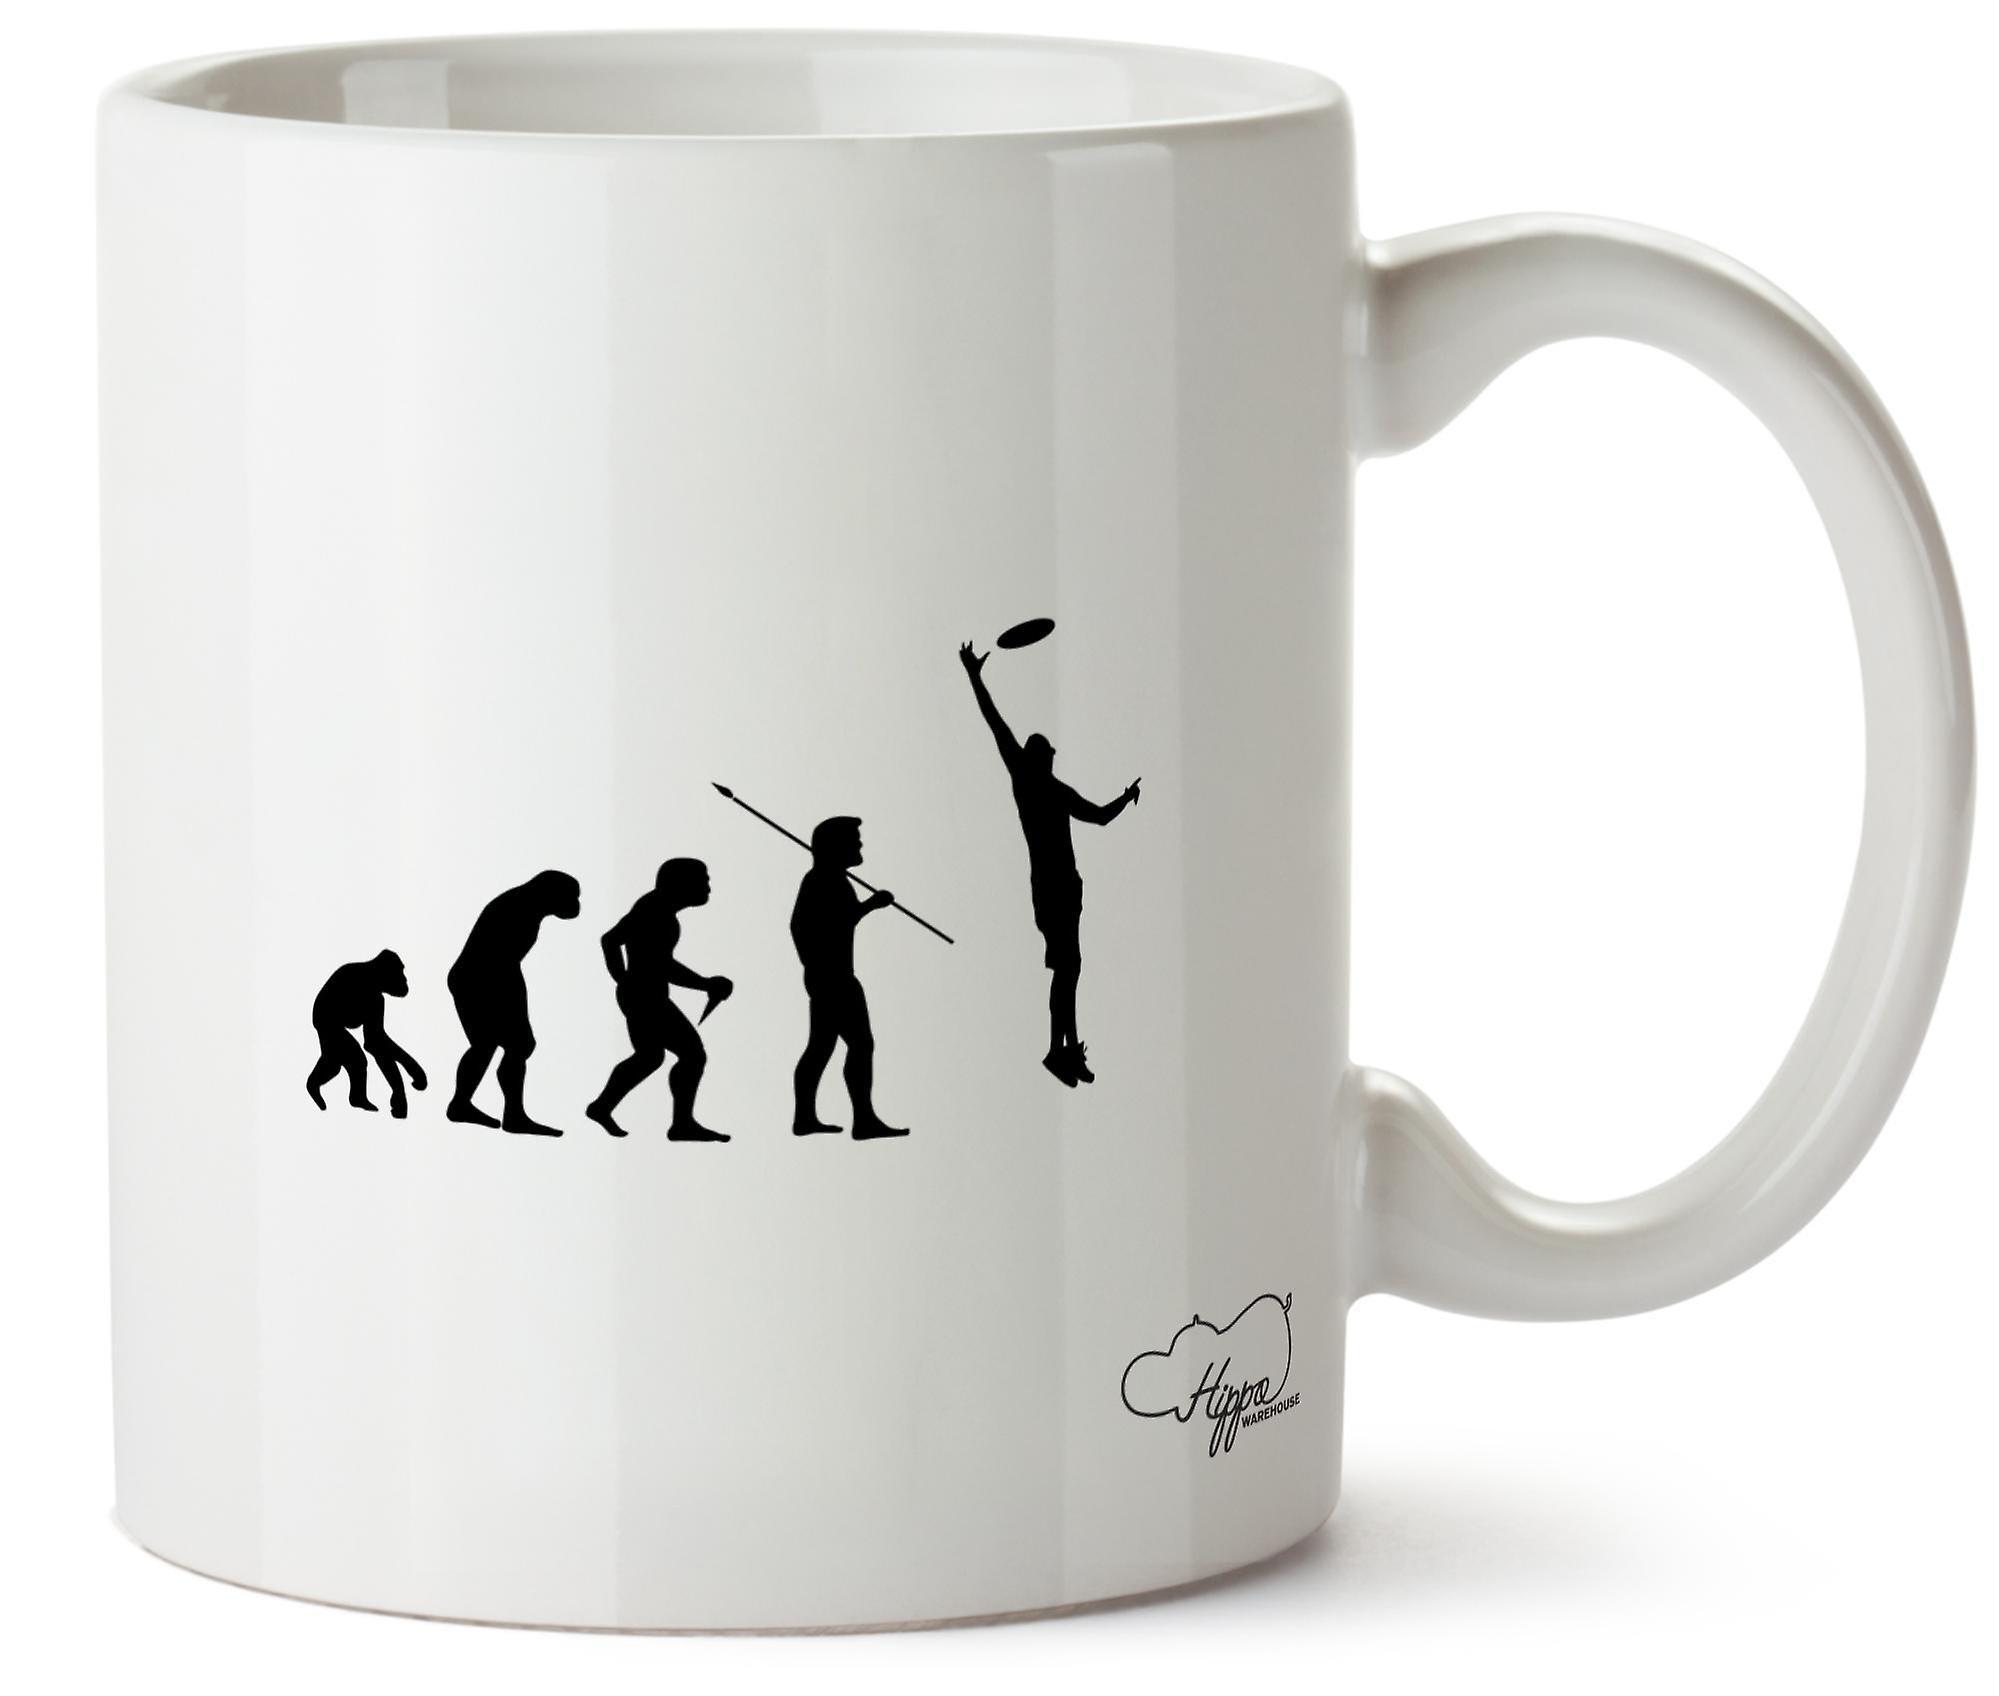 Hippowarehouse Frisbee Evolution Printed Mug Cup Ceramic 10oz